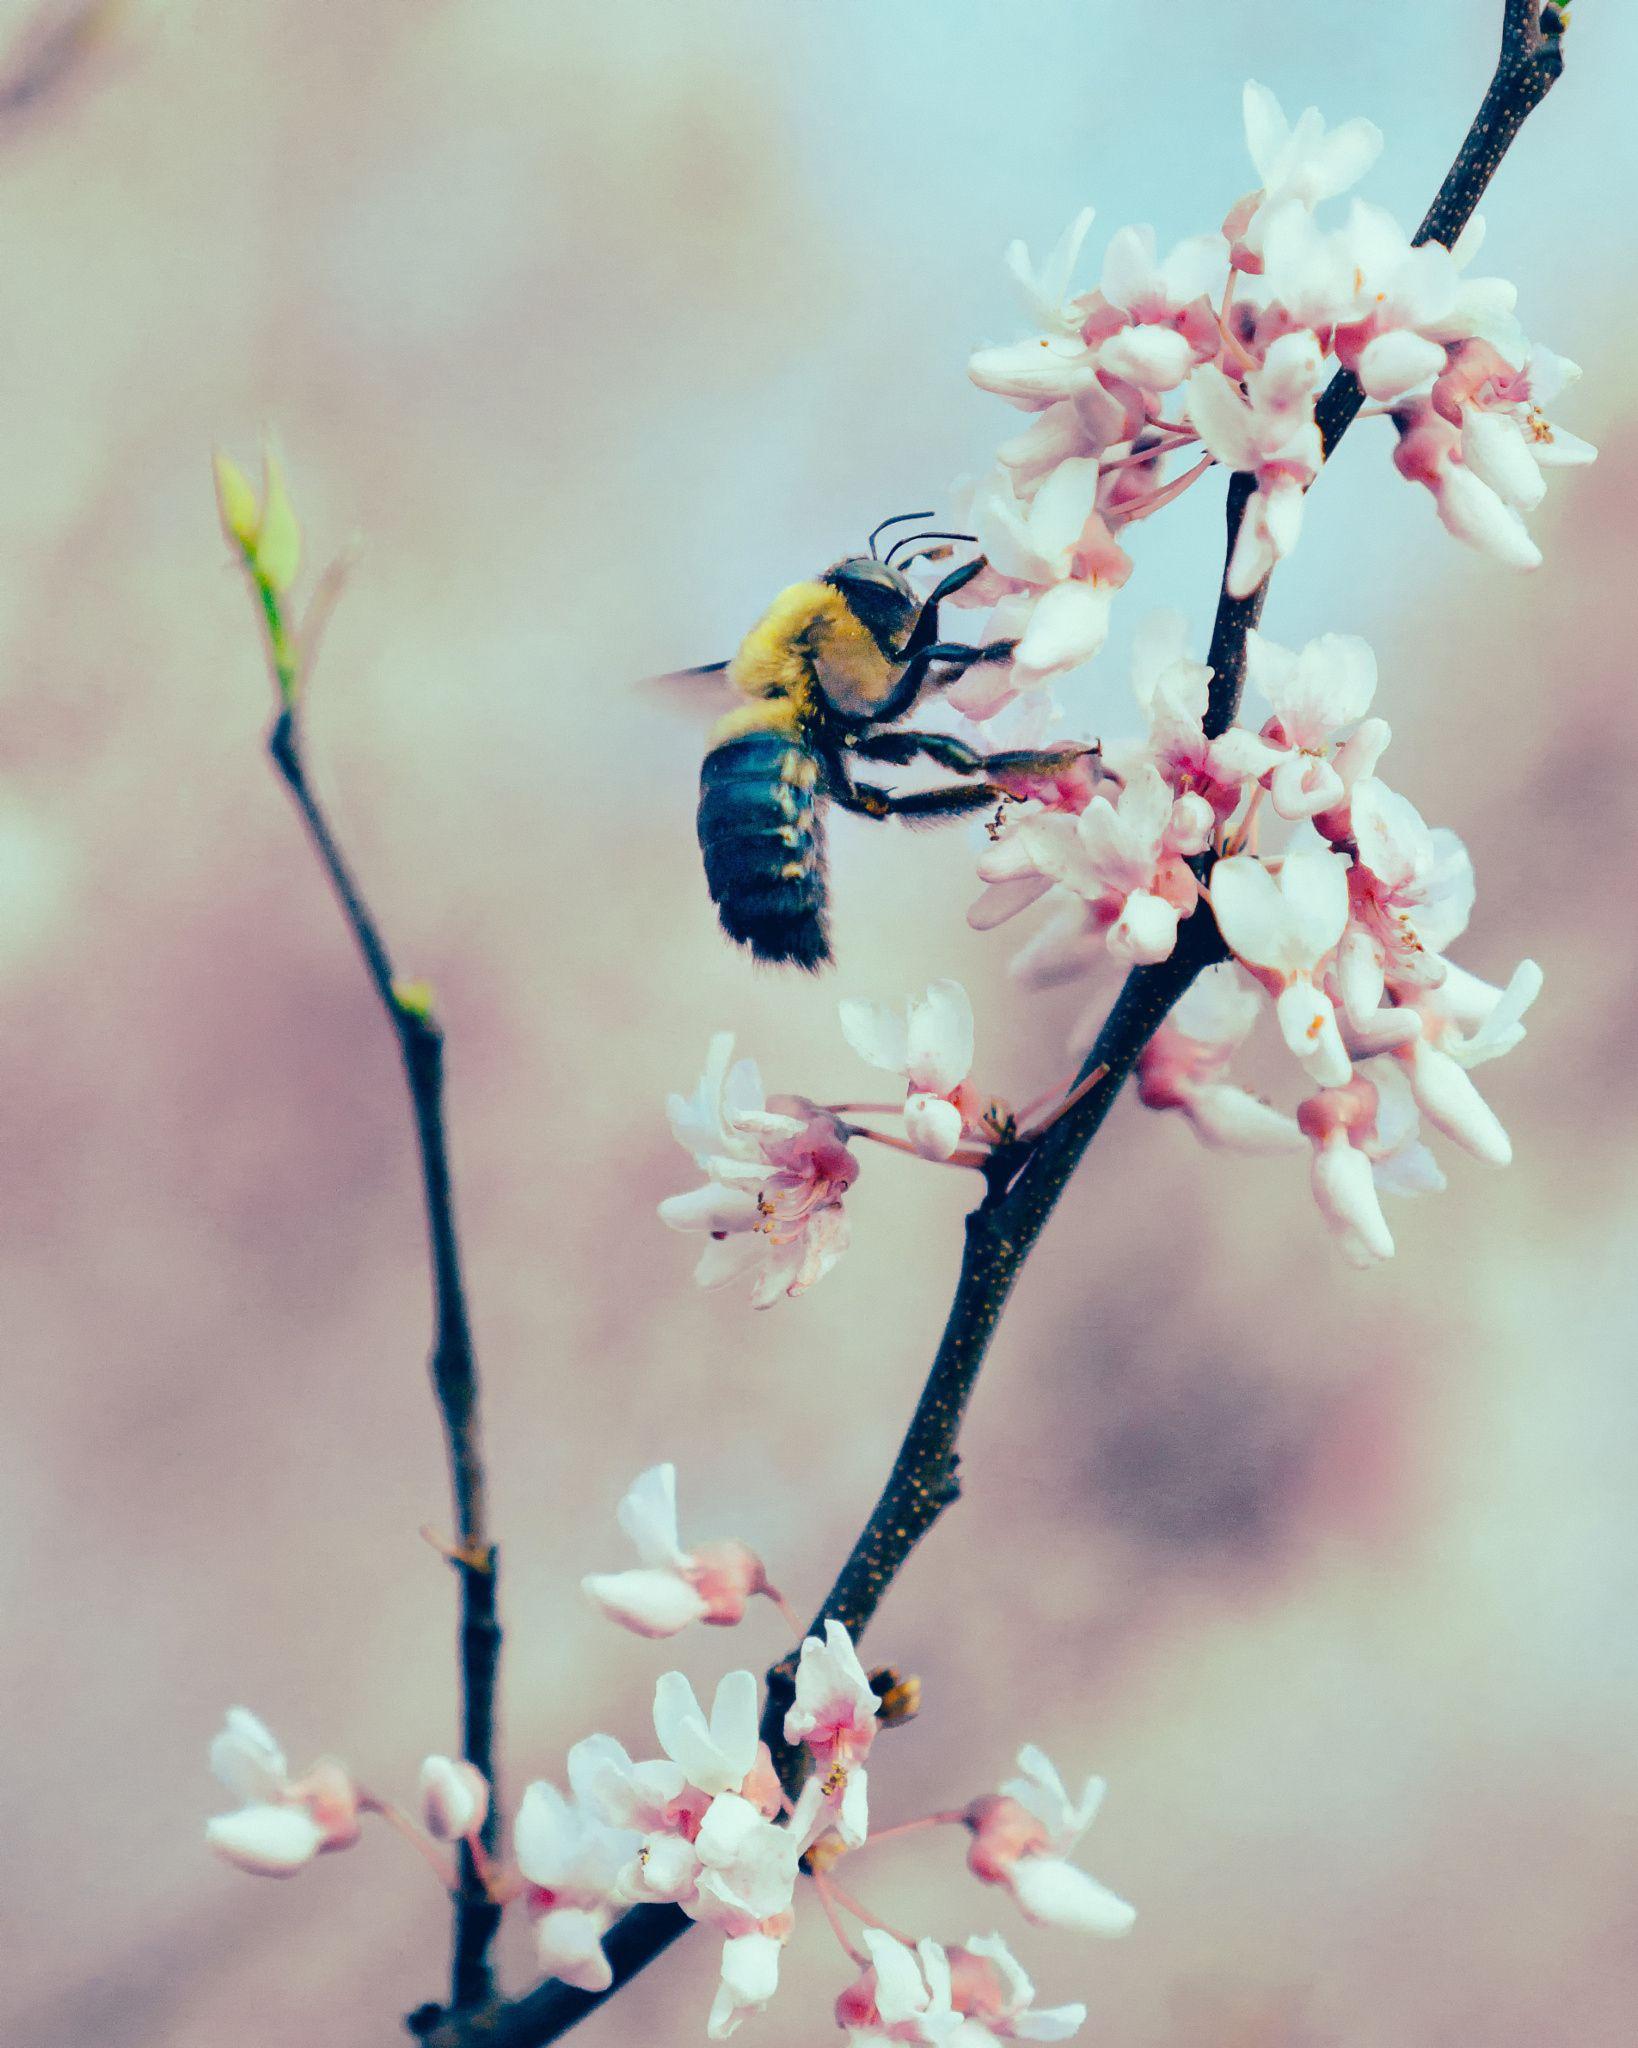 Bee on Redbud 8 by Rick Stufflebean